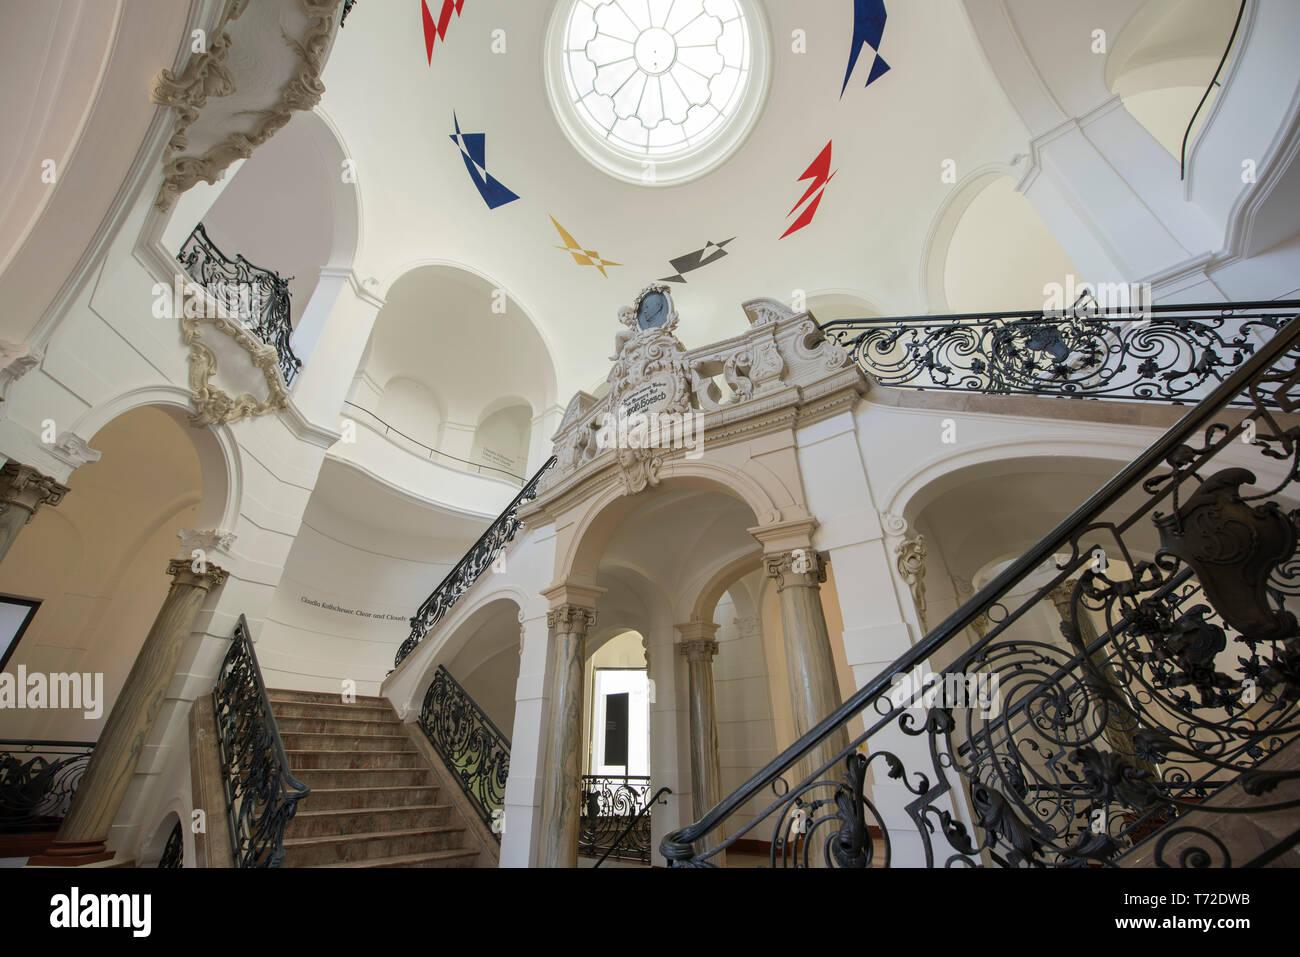 Deutschland, NRW, Düren, Leopold-Hoesch-Museum, - Stock Image